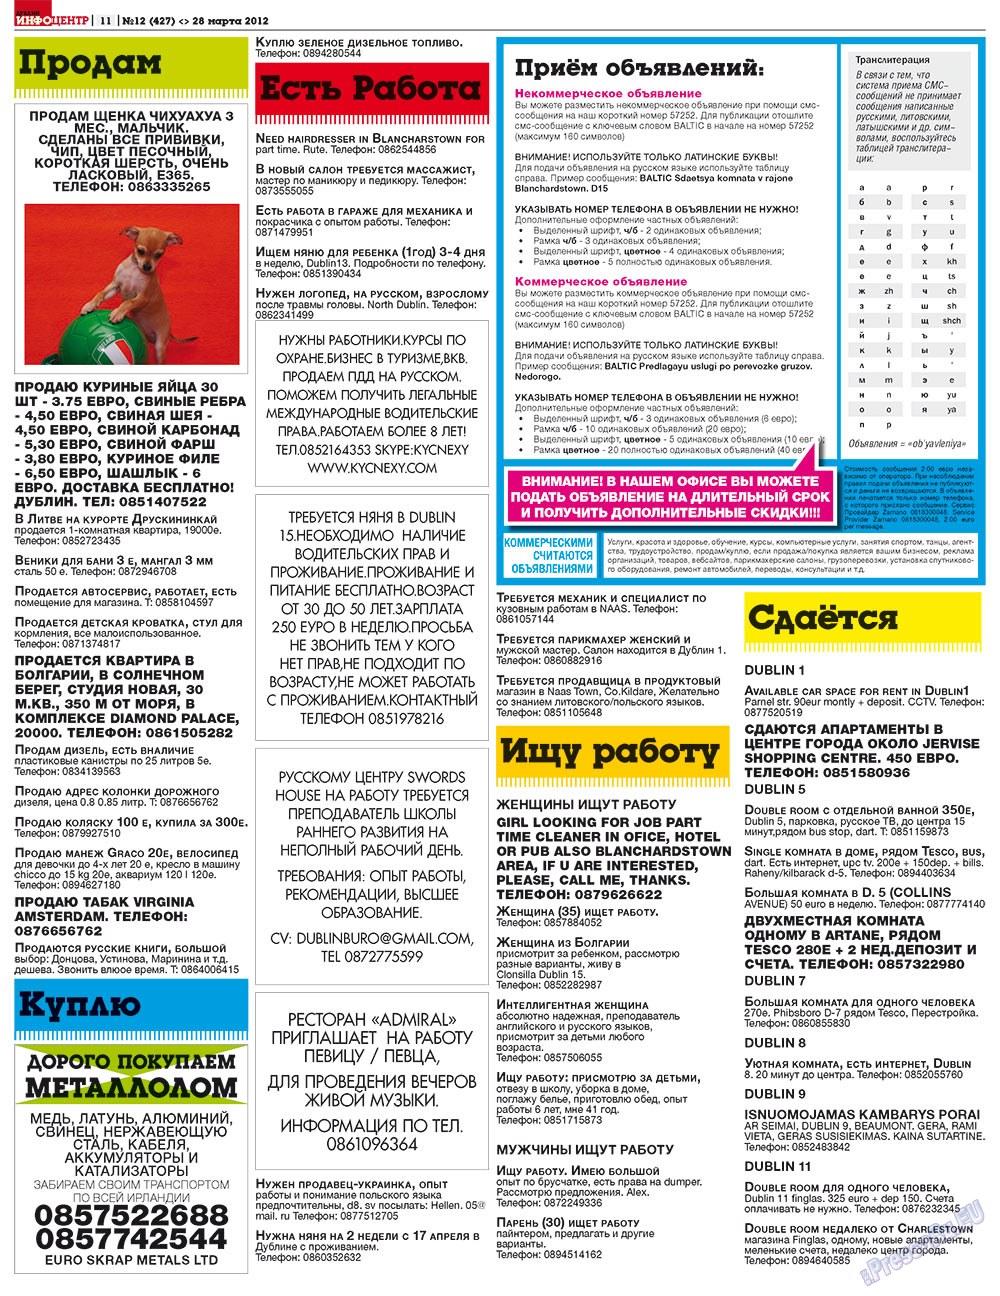 Дублин инфоцентр (газета). 2012 год, номер 12, стр. 11